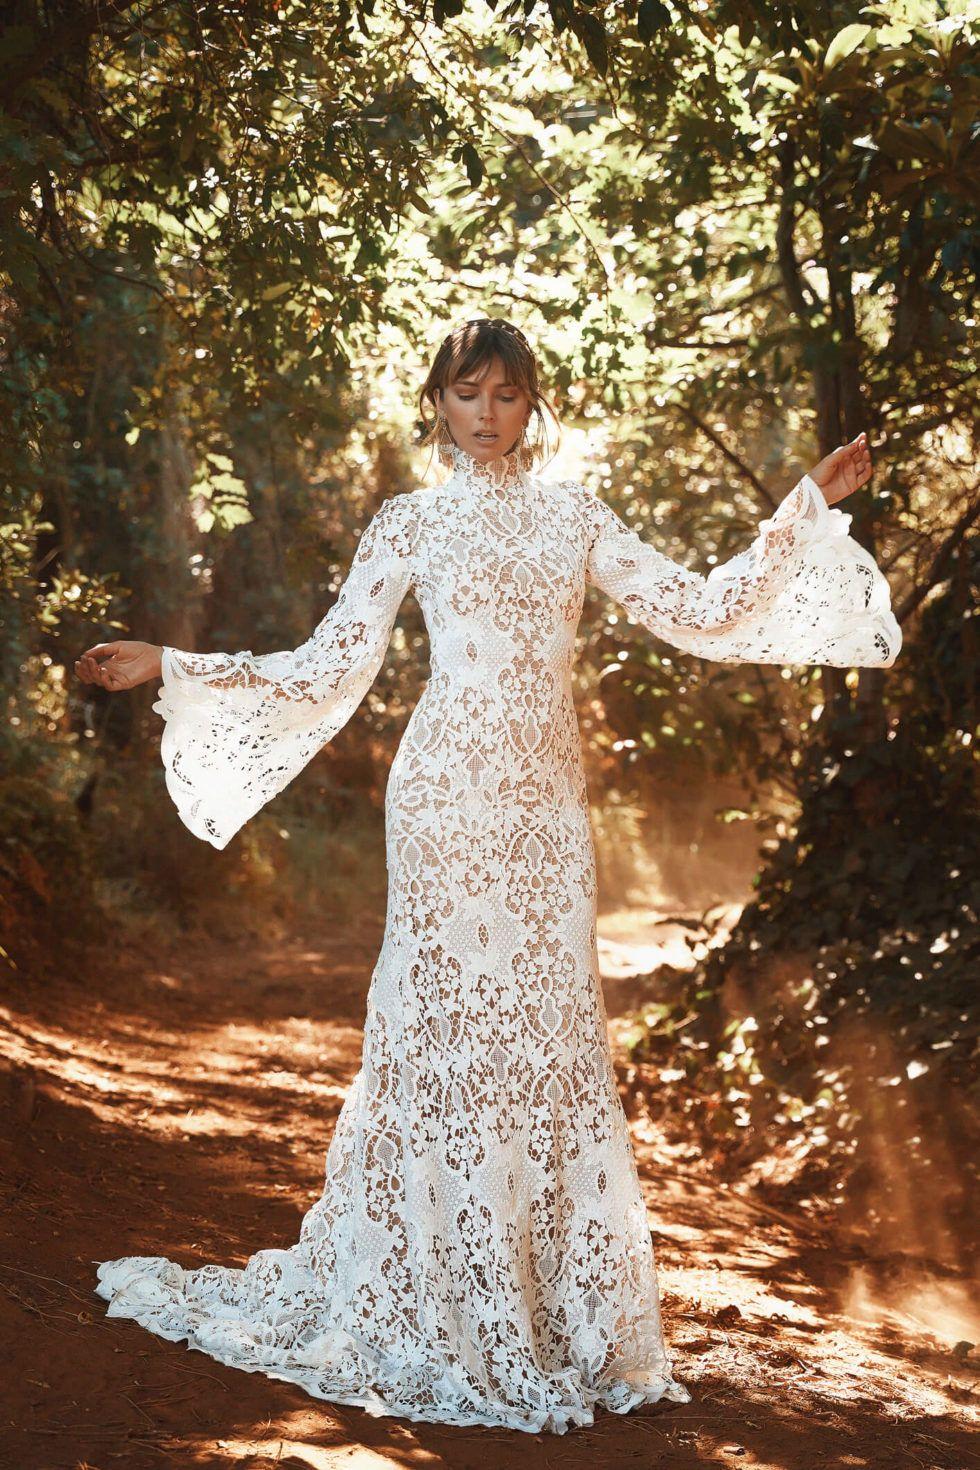 Vagabond Virginia Gown From The Liberty Collection Bridetobe Weddingdress Modest Wedding Dresses Plus Size Wedding Dresses With Sleeves Utah Wedding Dress [ 1470 x 980 Pixel ]